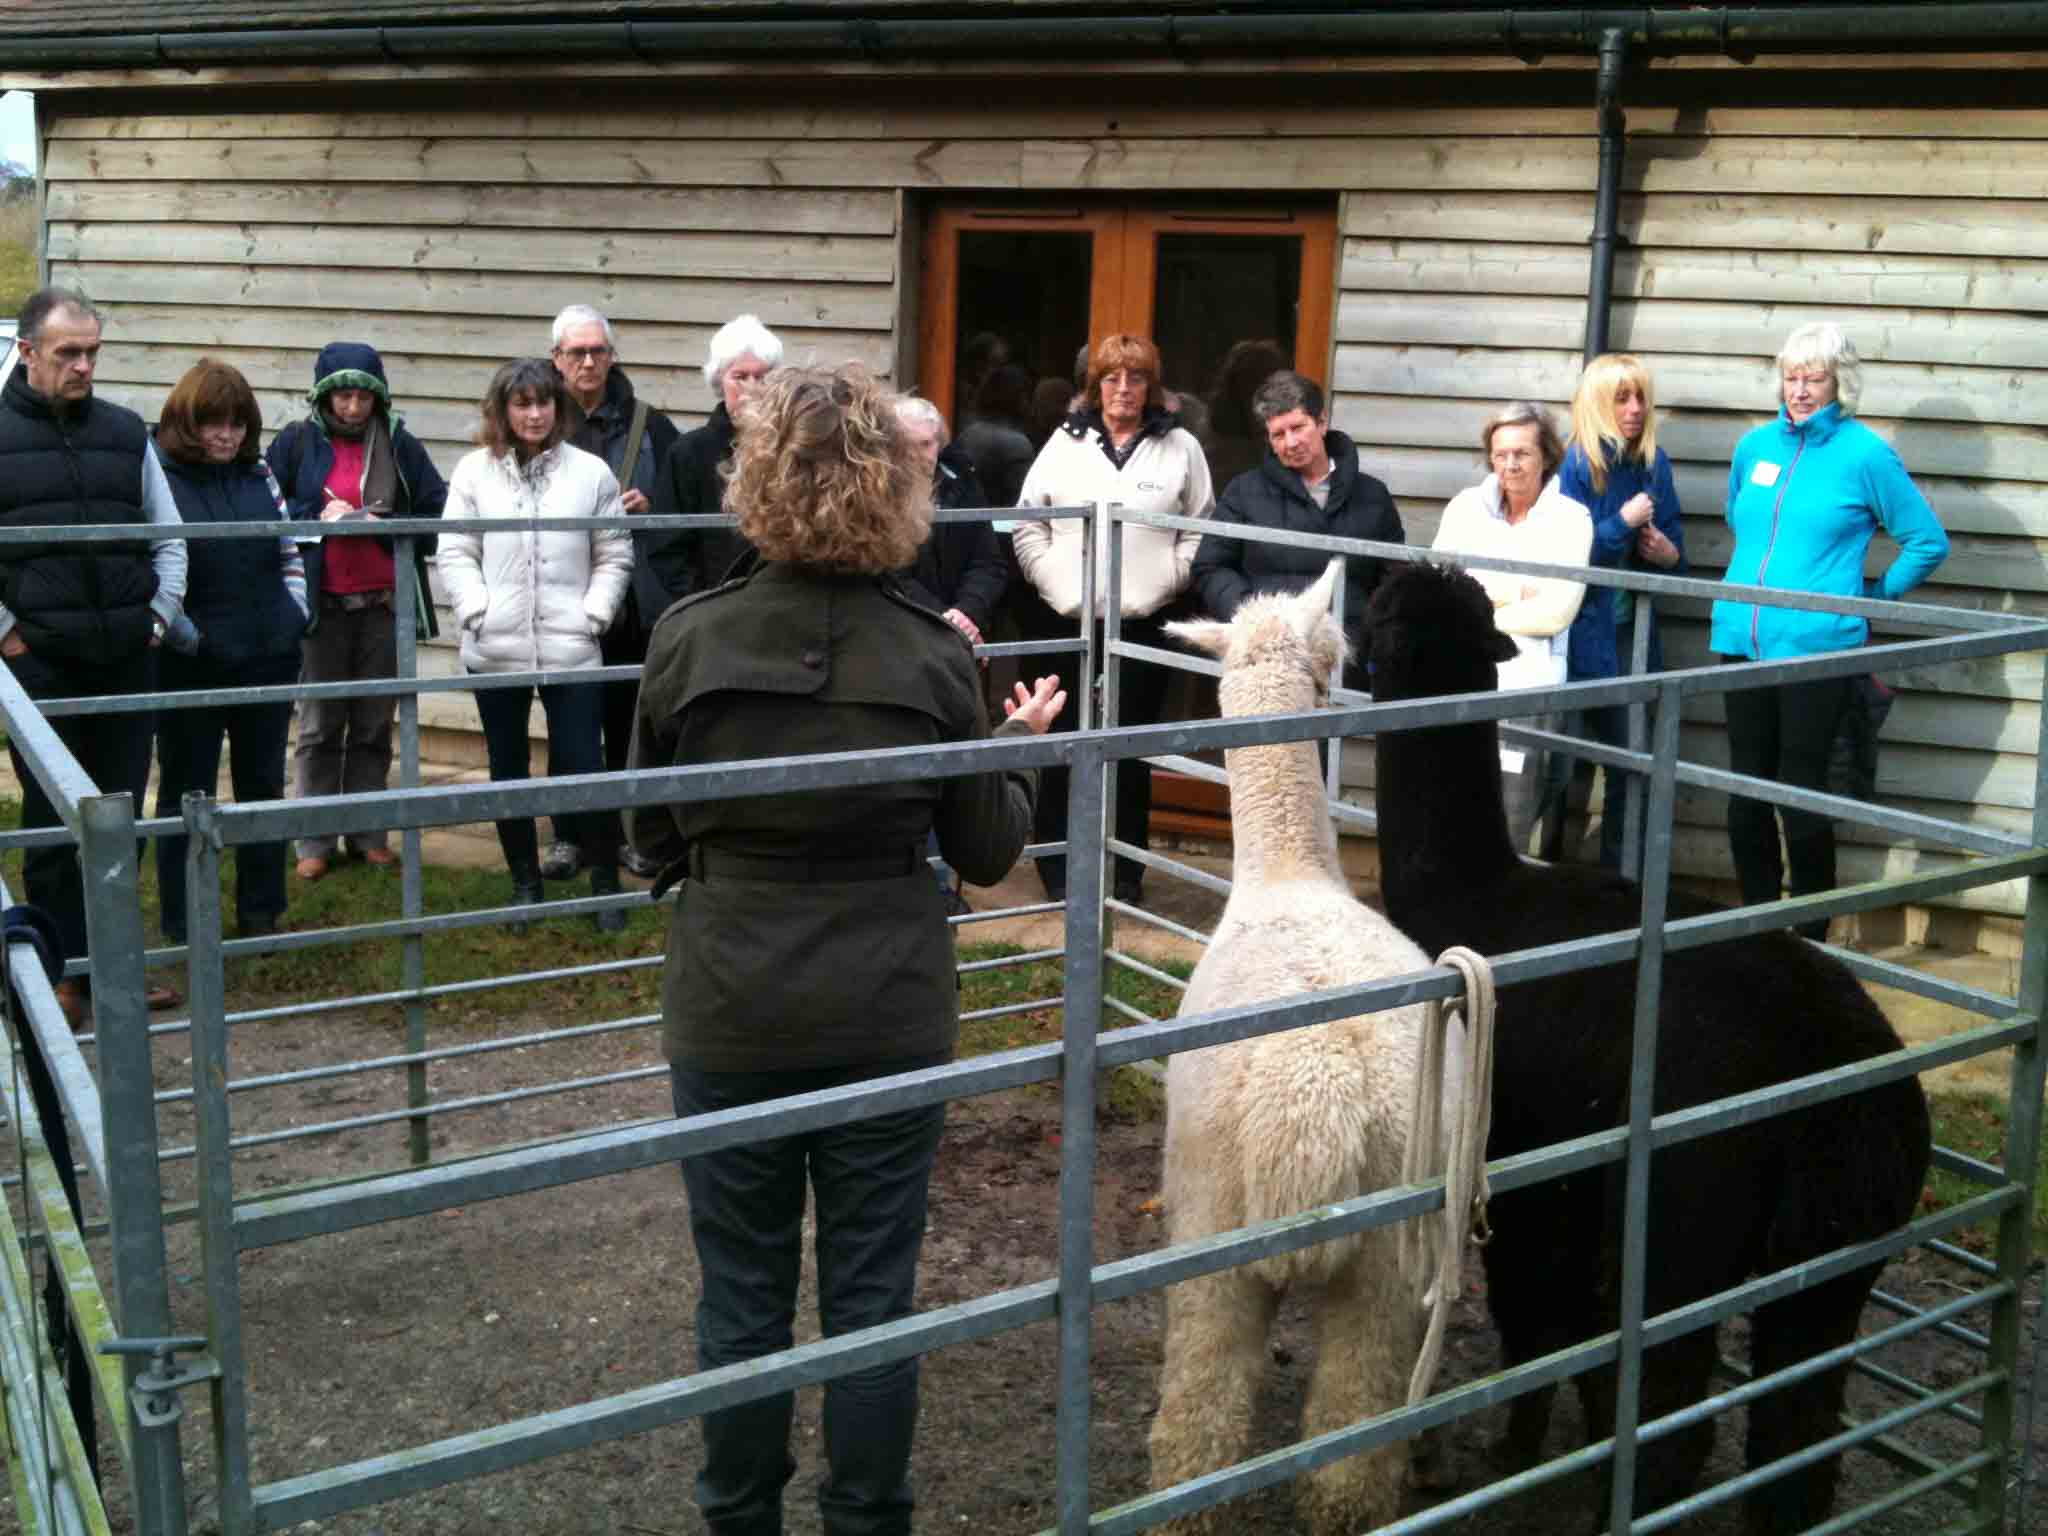 Alpaca beginners day demonstration at spring farm alpacas